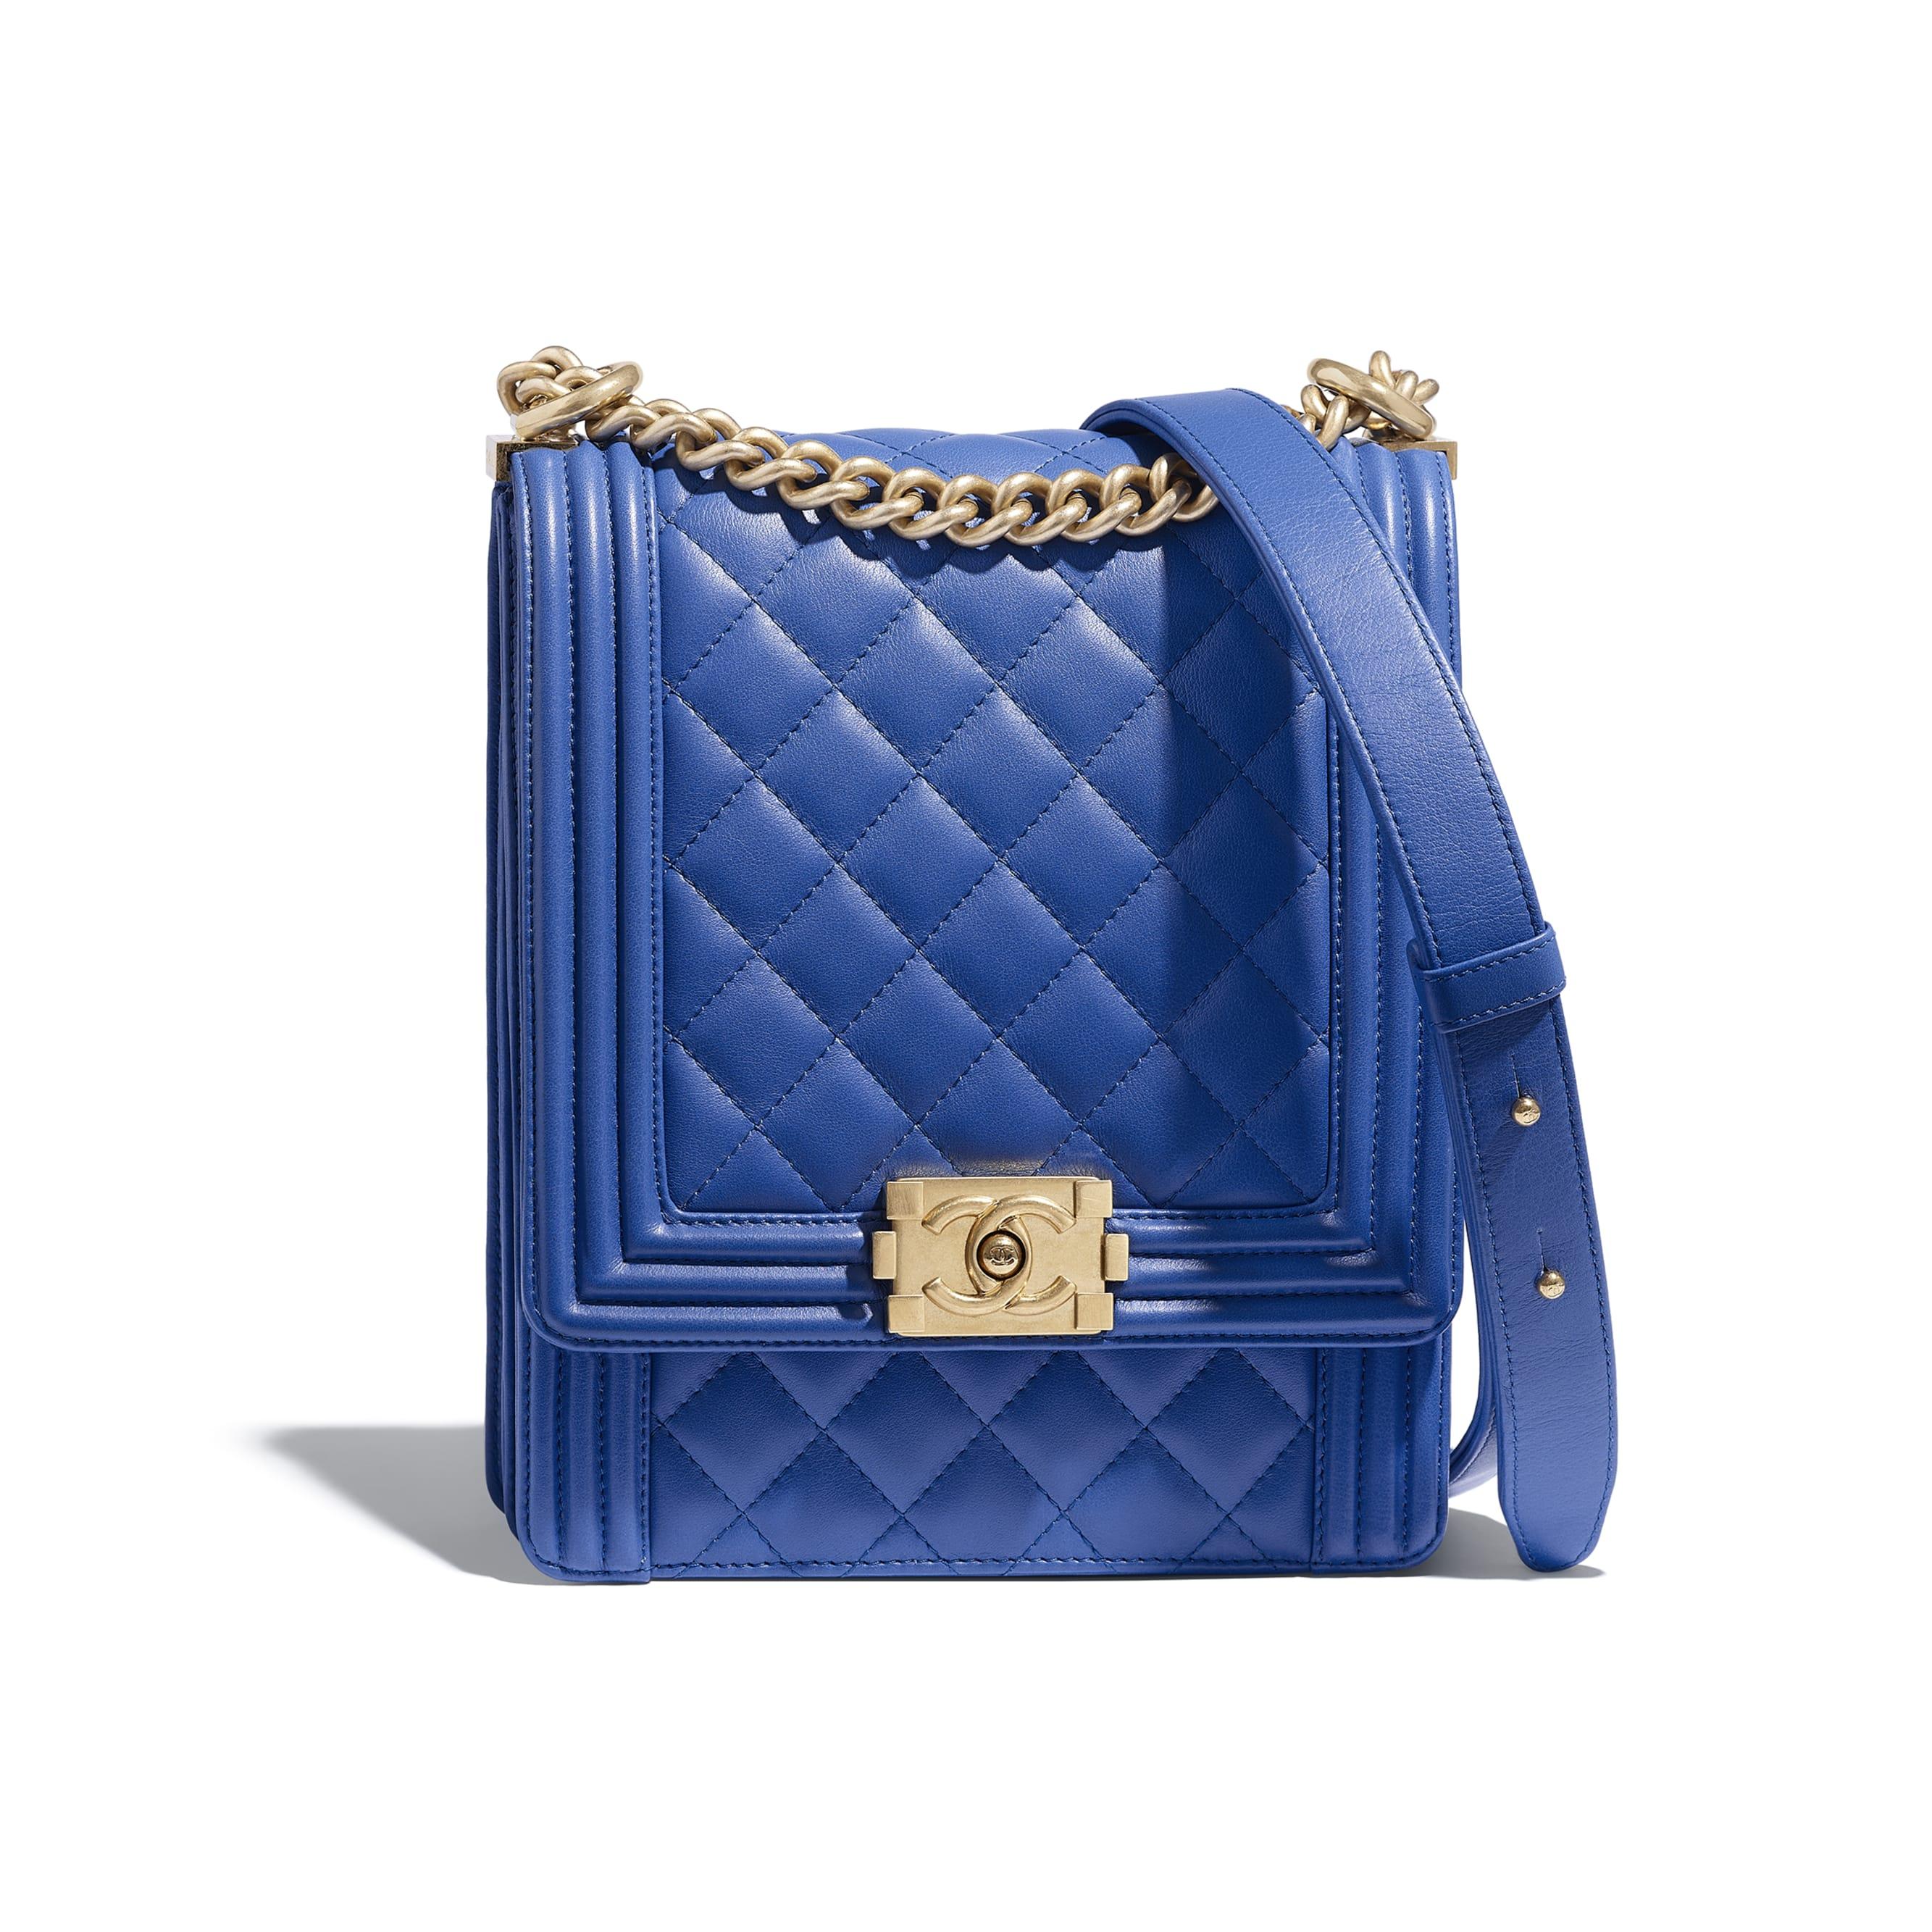 Boy Chanel Handbag Blue Calfskin Gold Tone Metal Default View